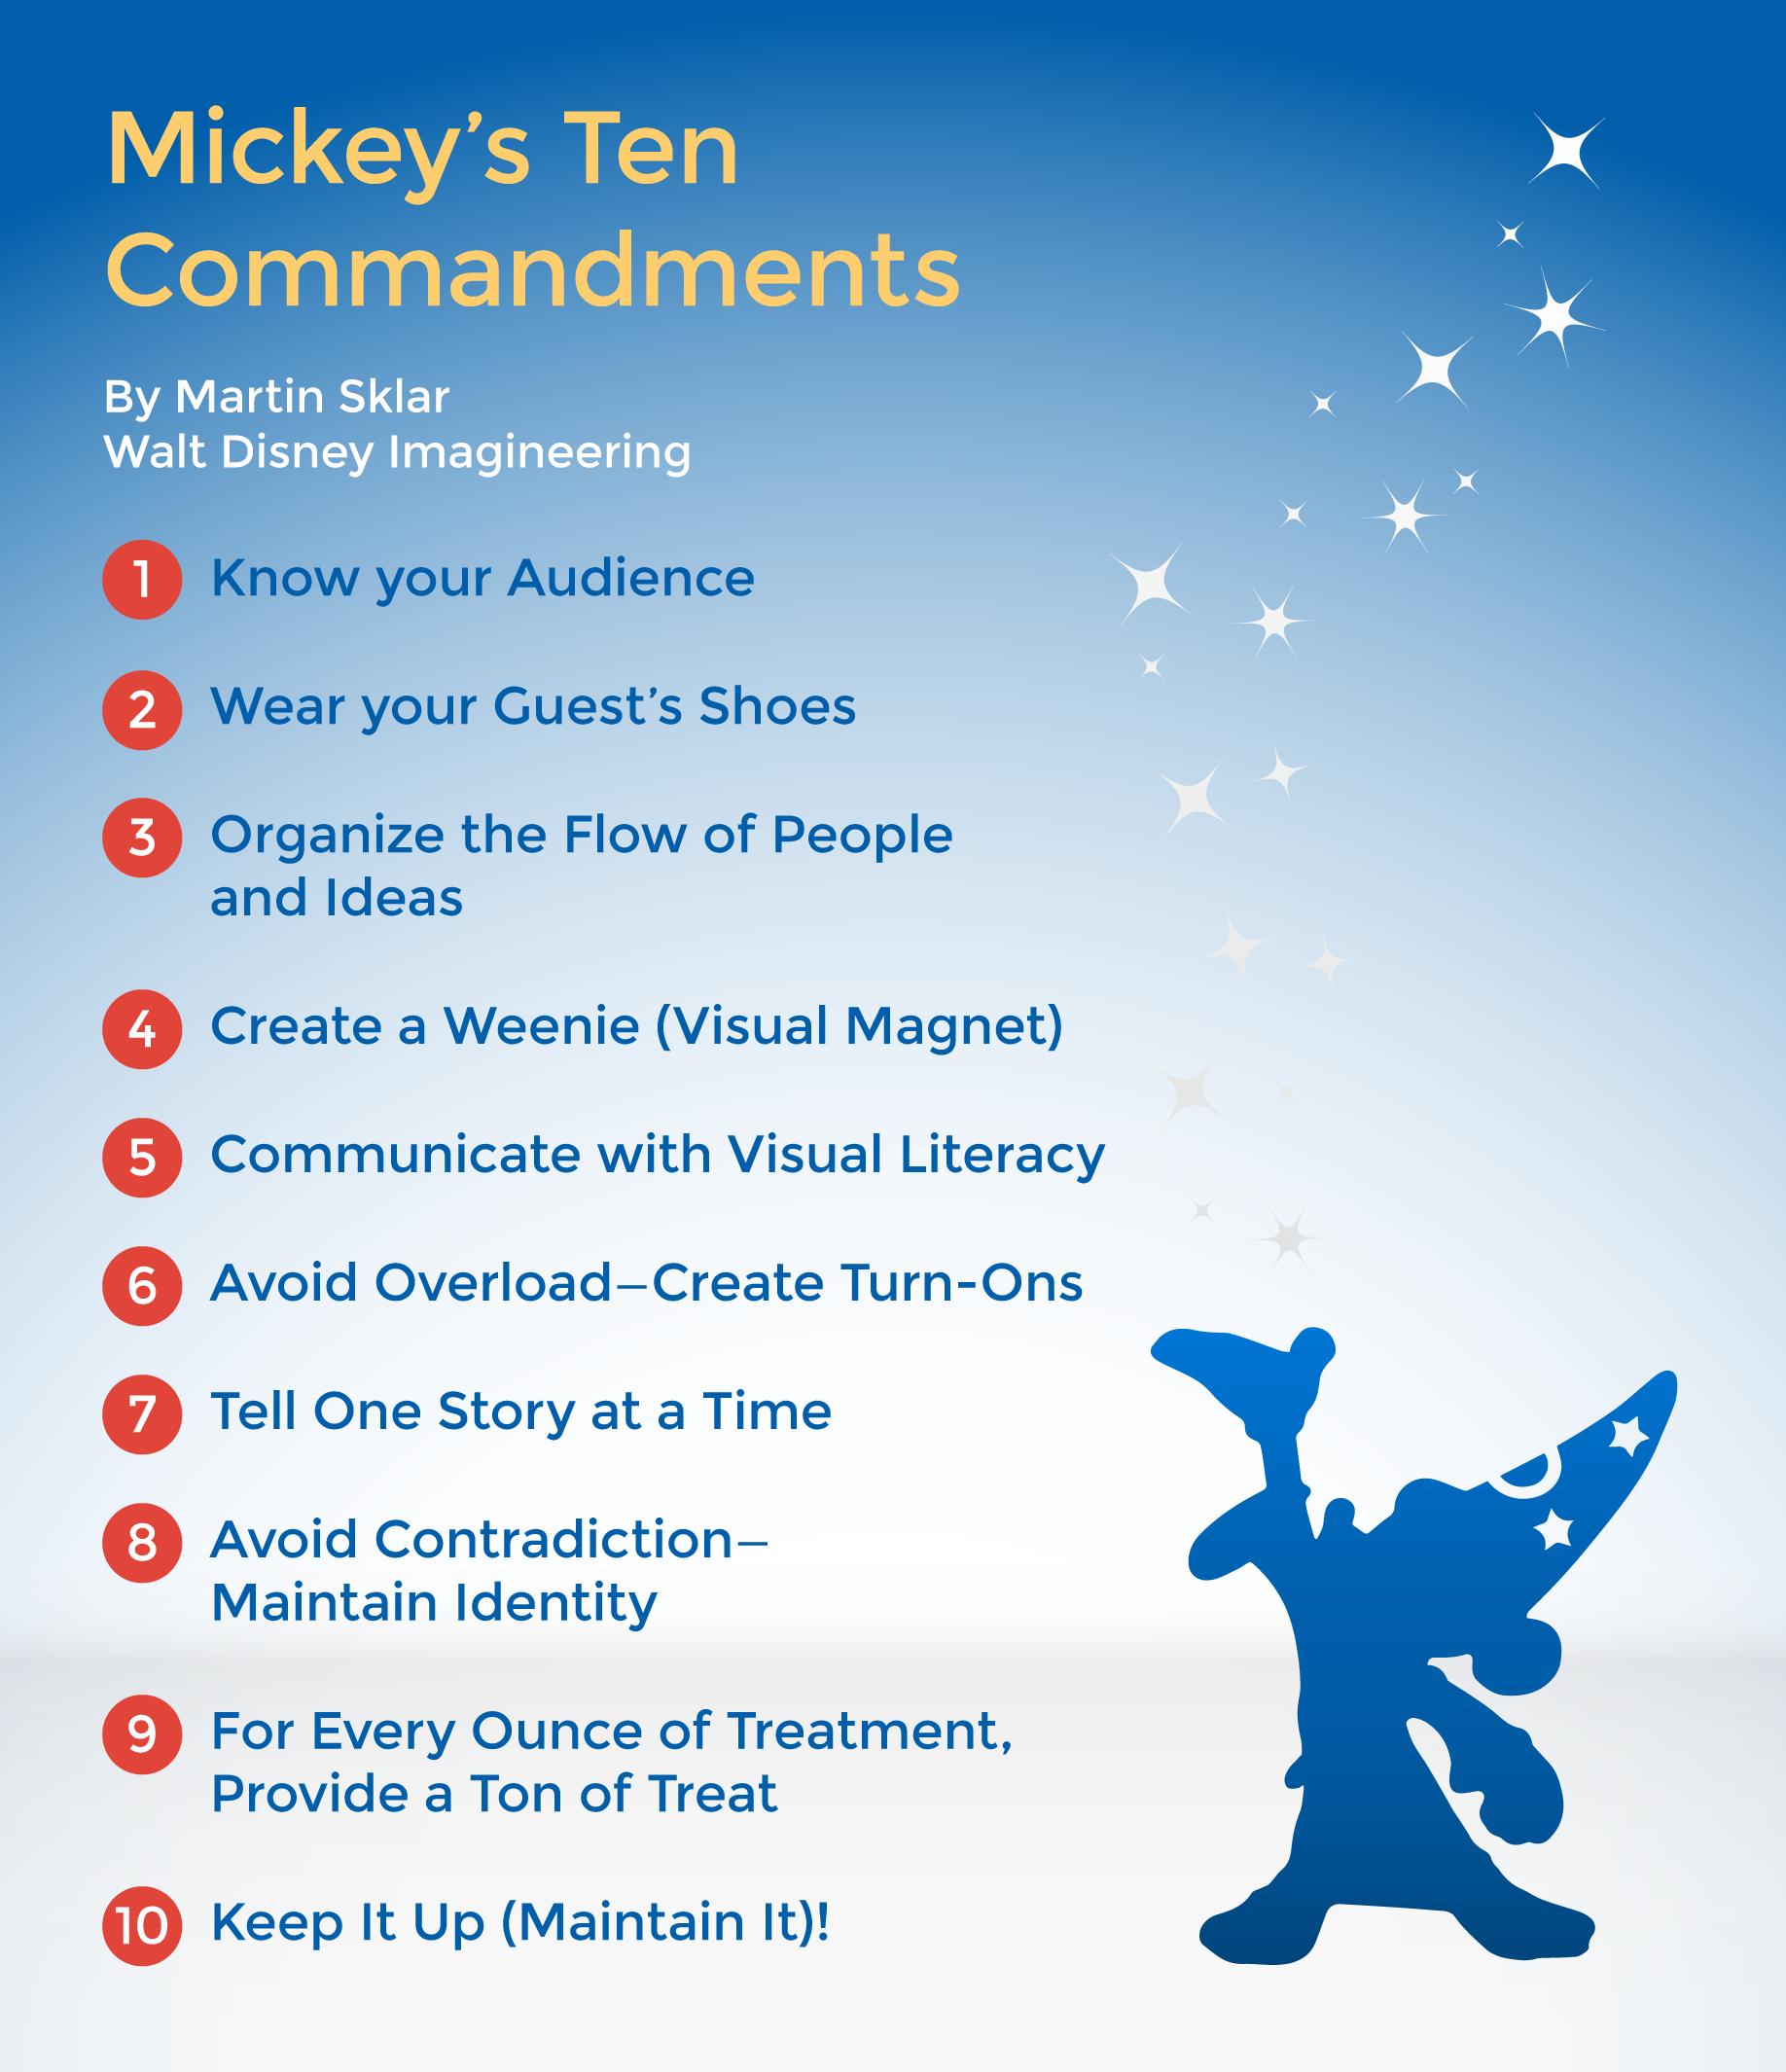 Mickey's Ten Commandments | Jason Bitner Art & Design